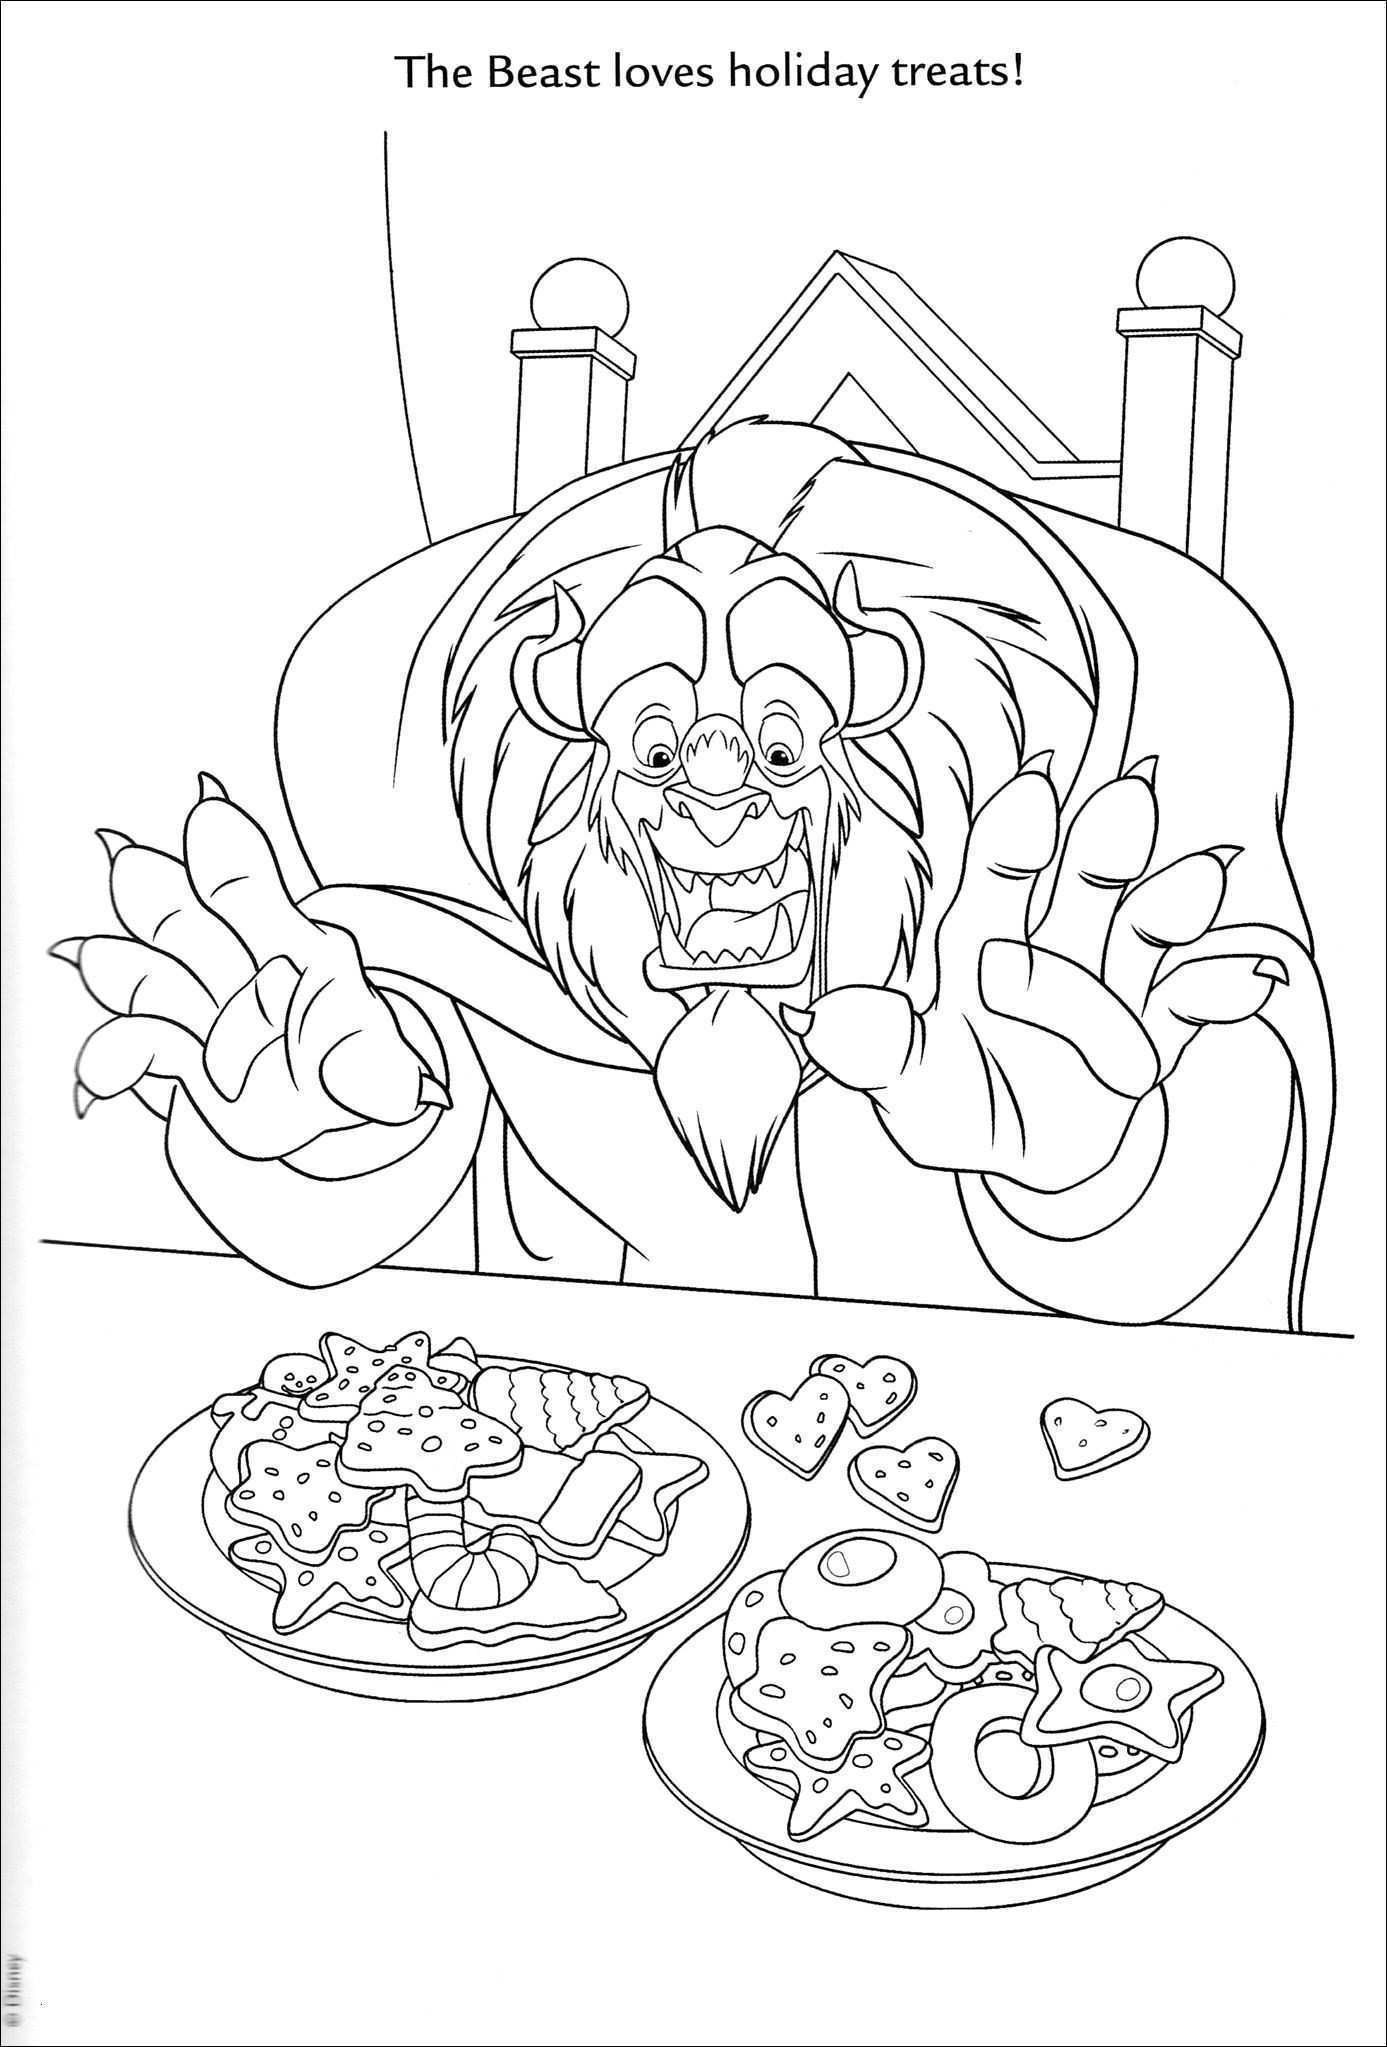 Happy Birthday Ausmalbilder Neu Keith Haring Malvorlagen Ideen Malvorlagen Mandala Mandala Ausmalen Fotos